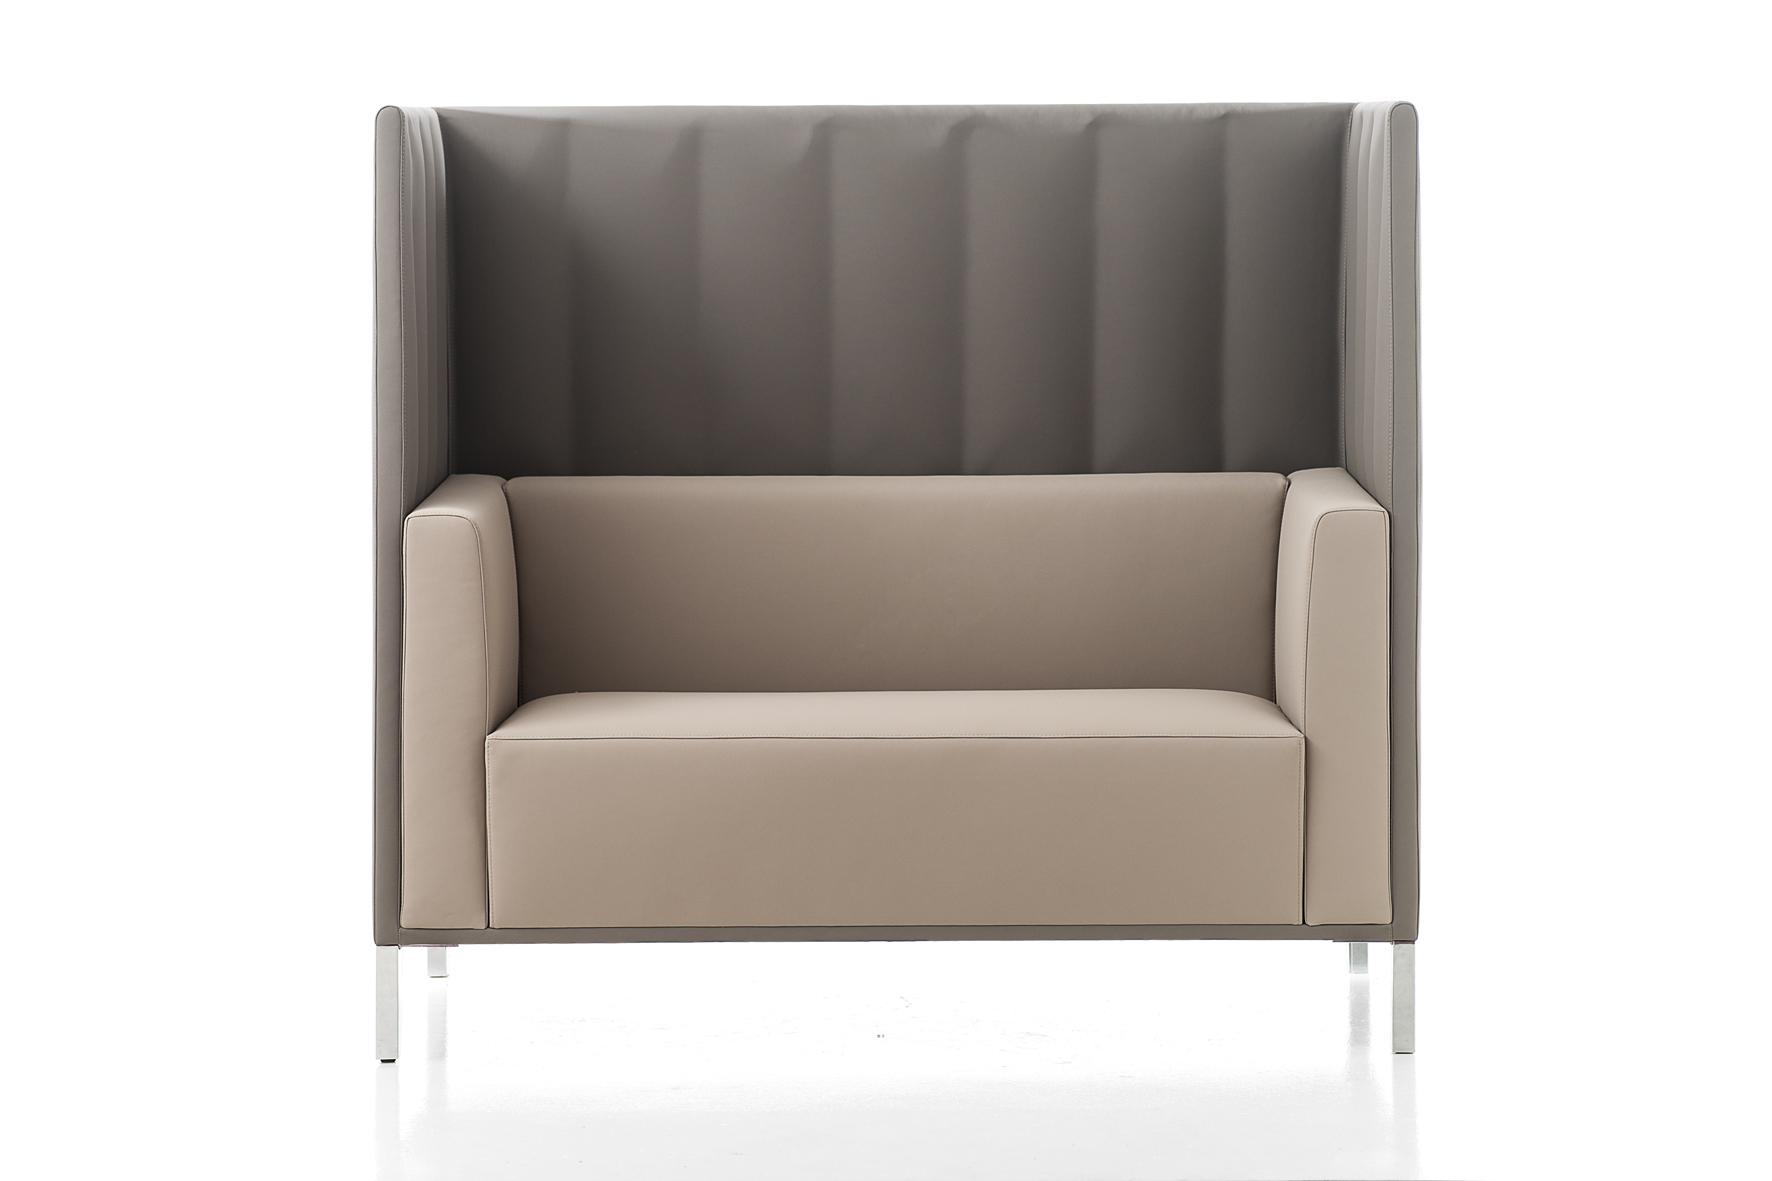 Kastel - Sedute per ufficio, comunitá e casa. Sedie, tavoli e ...